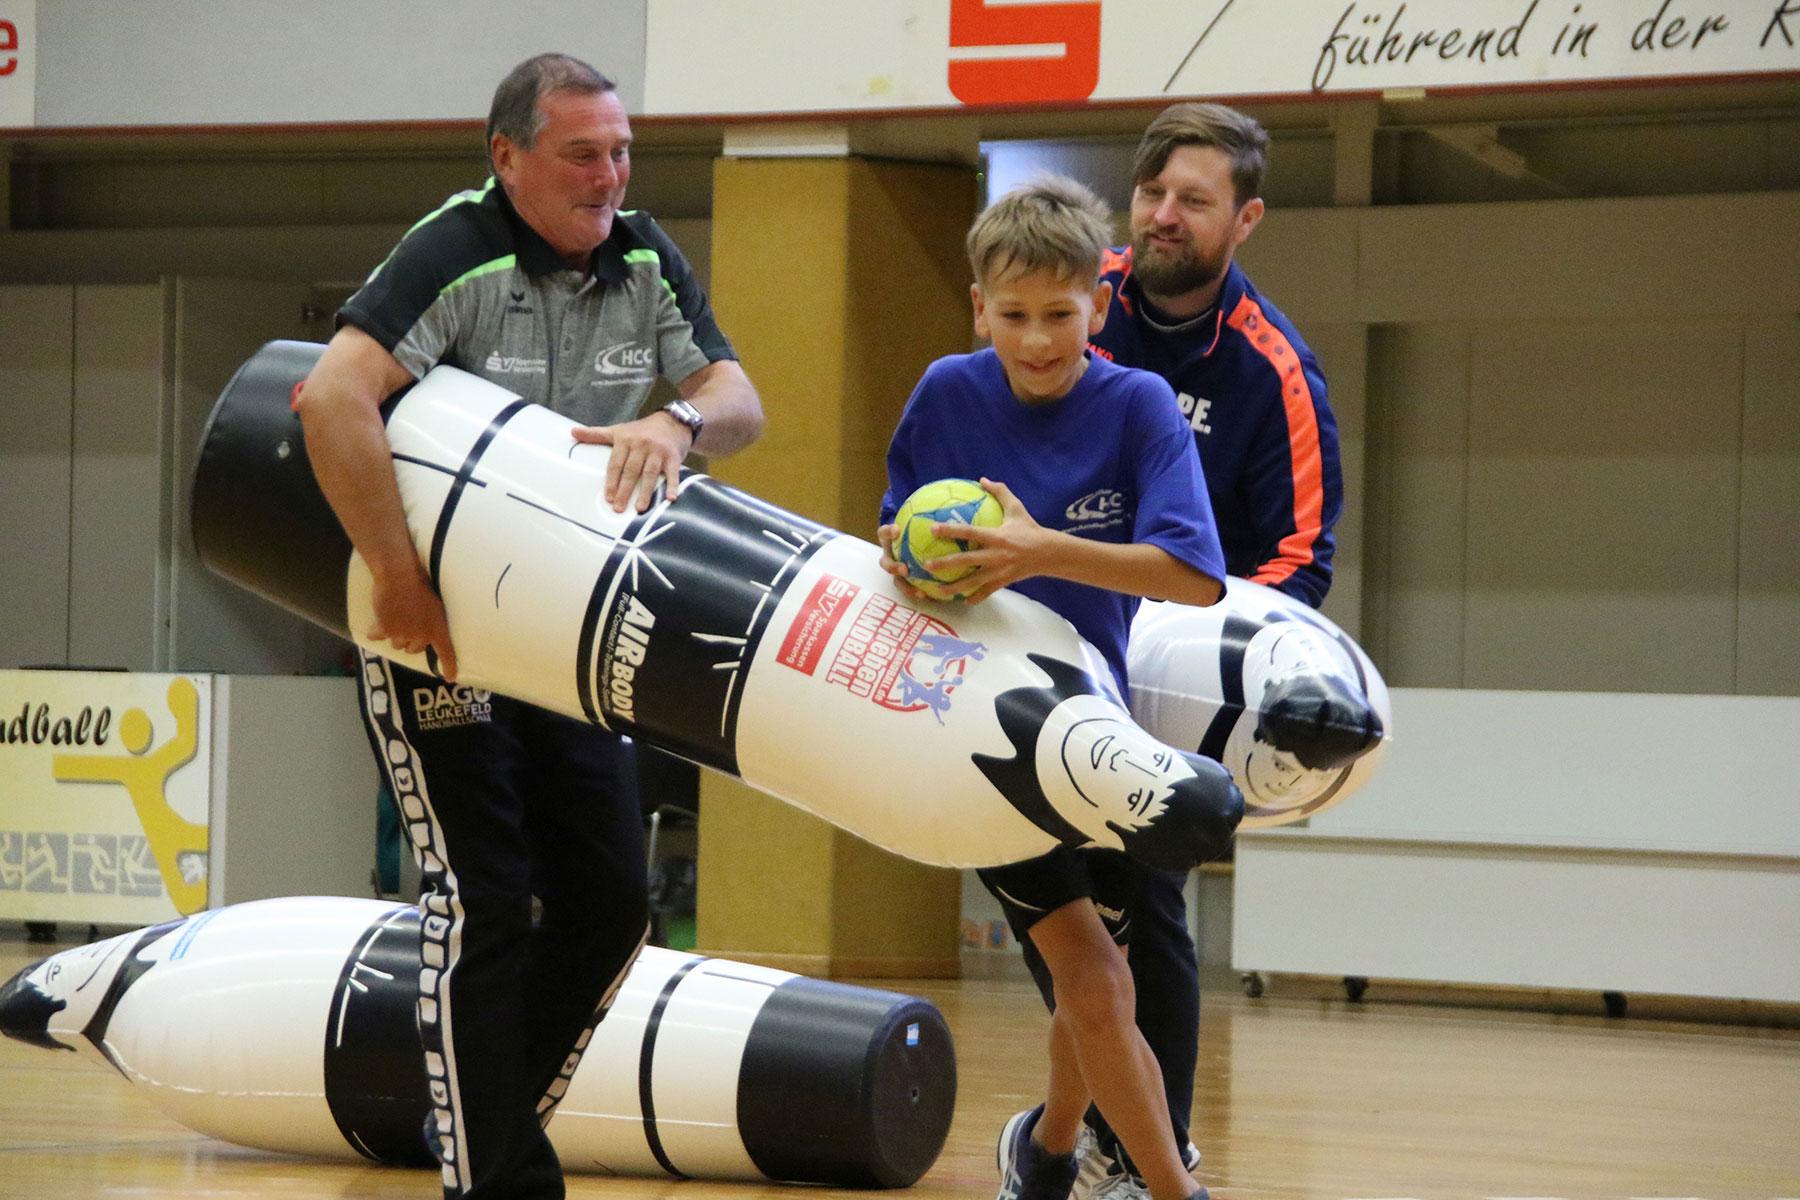 201809_Handballcamp_NDH (67)